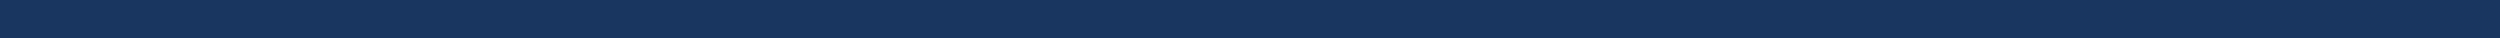 CaylorDesign&Const-bar.jpg